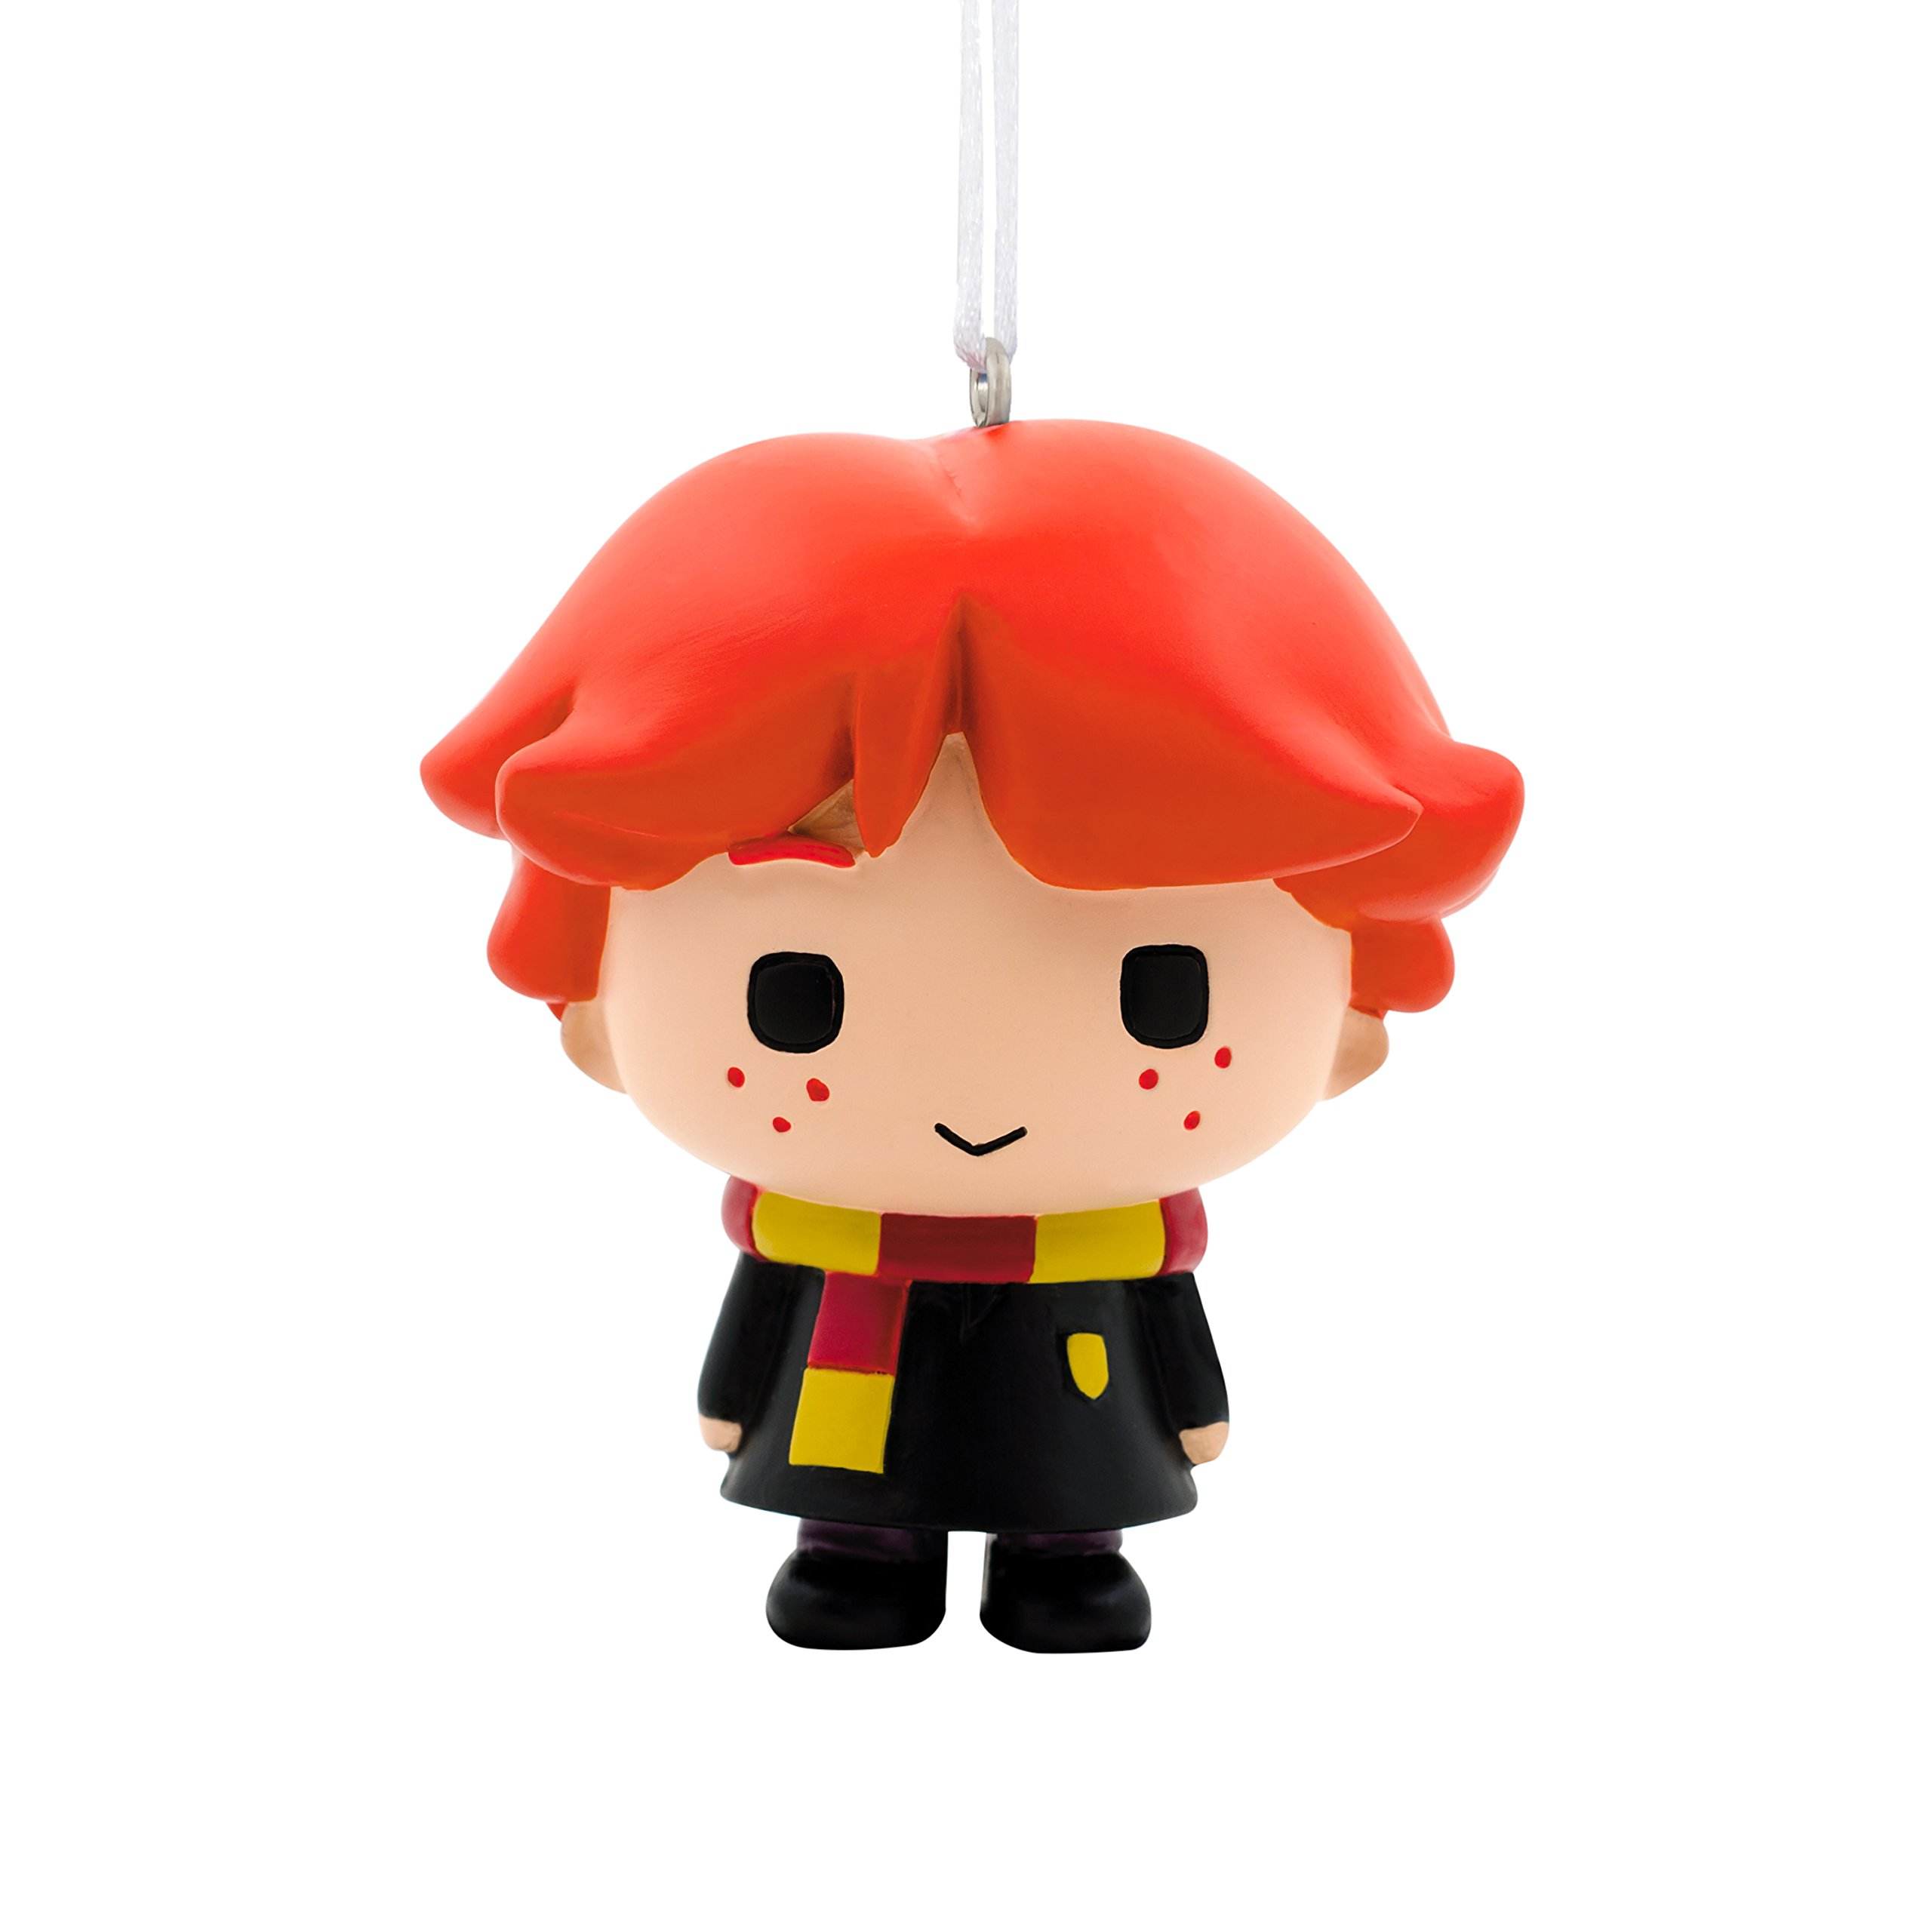 Hallmark Christmas Ornament Harry Potter Ron Weasley, Ron Weasley, Ron Weasley